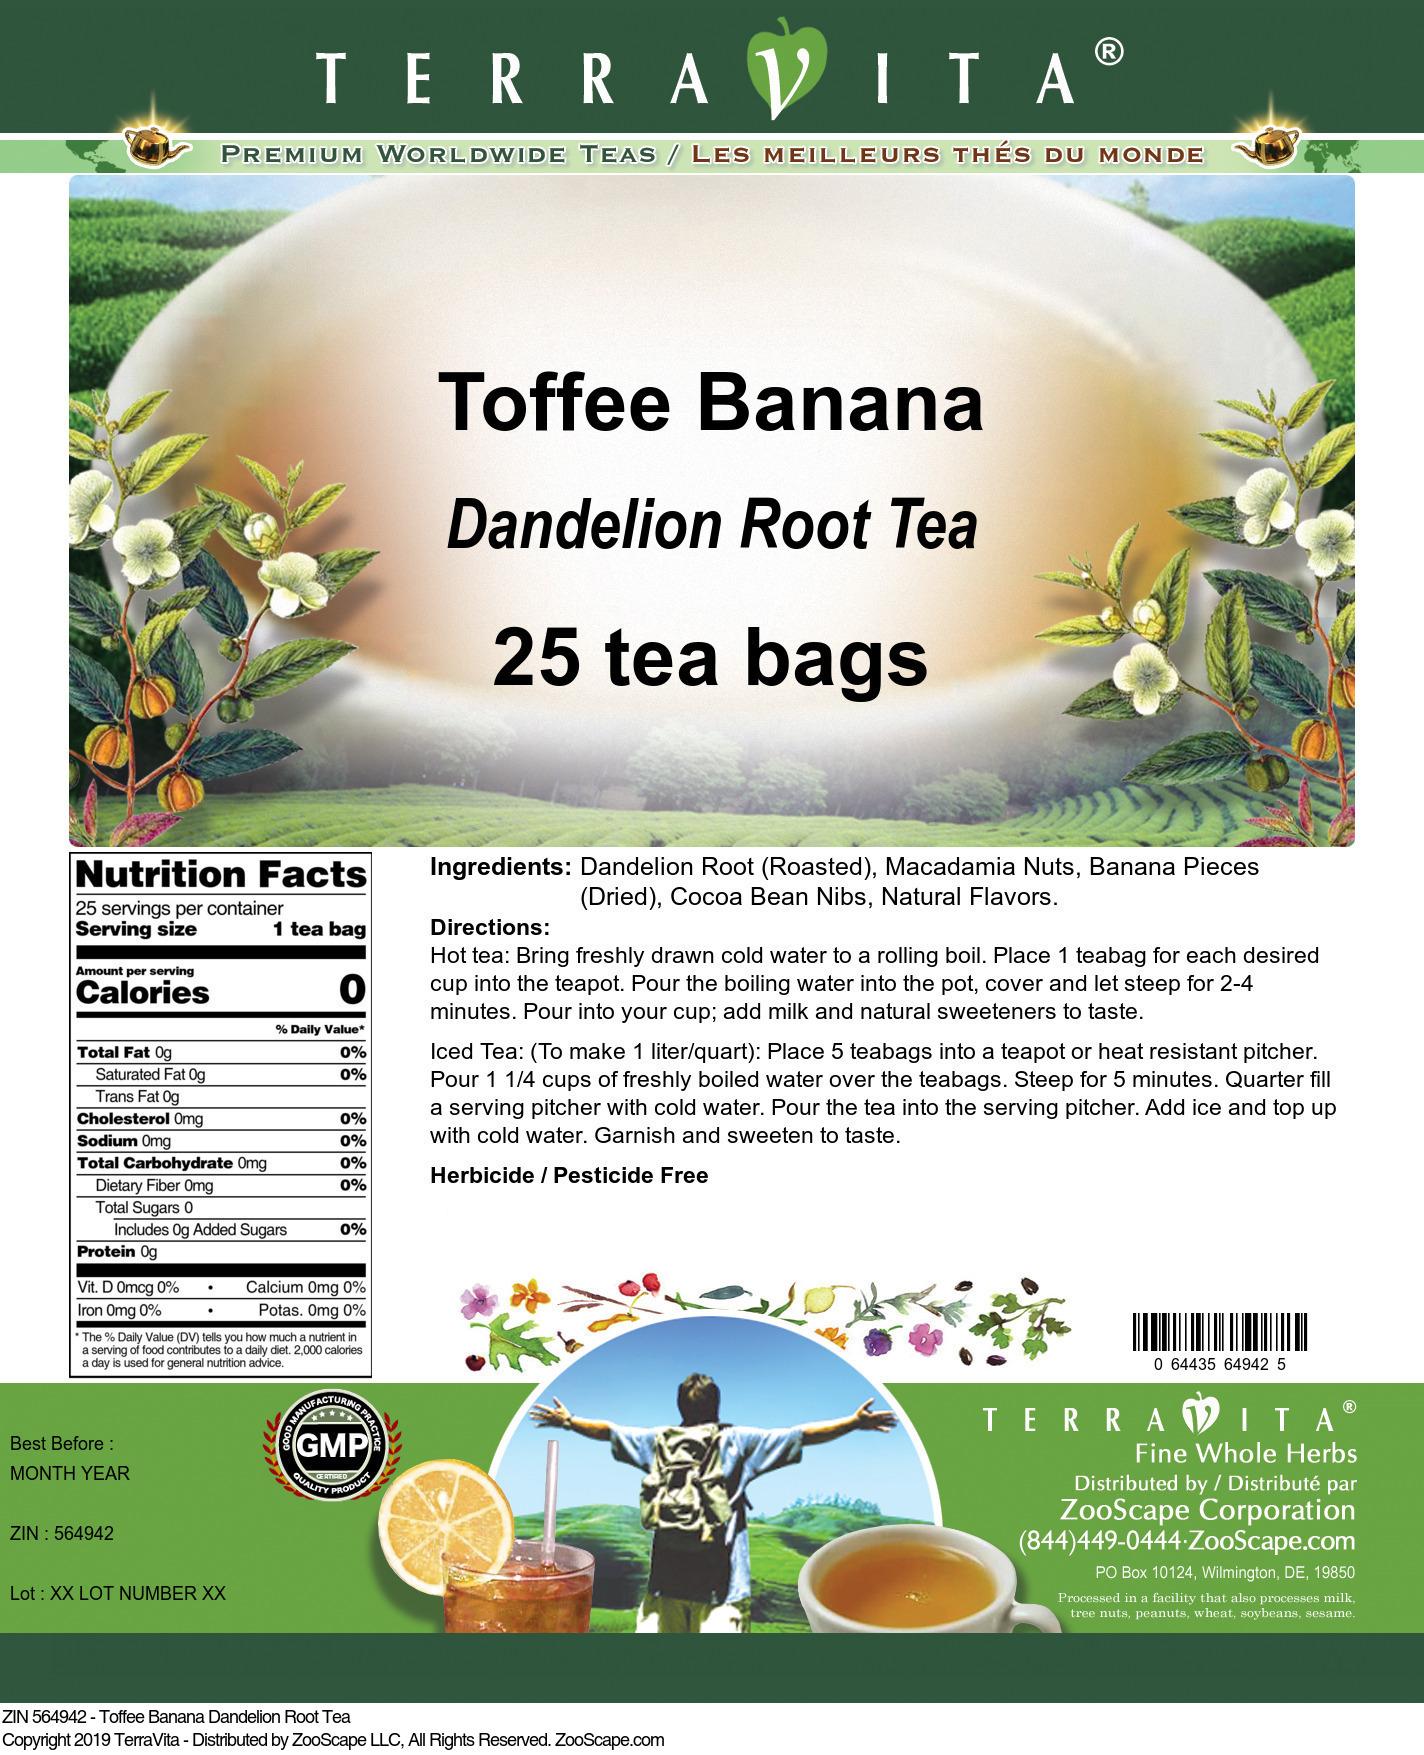 Toffee Banana Dandelion Root Tea